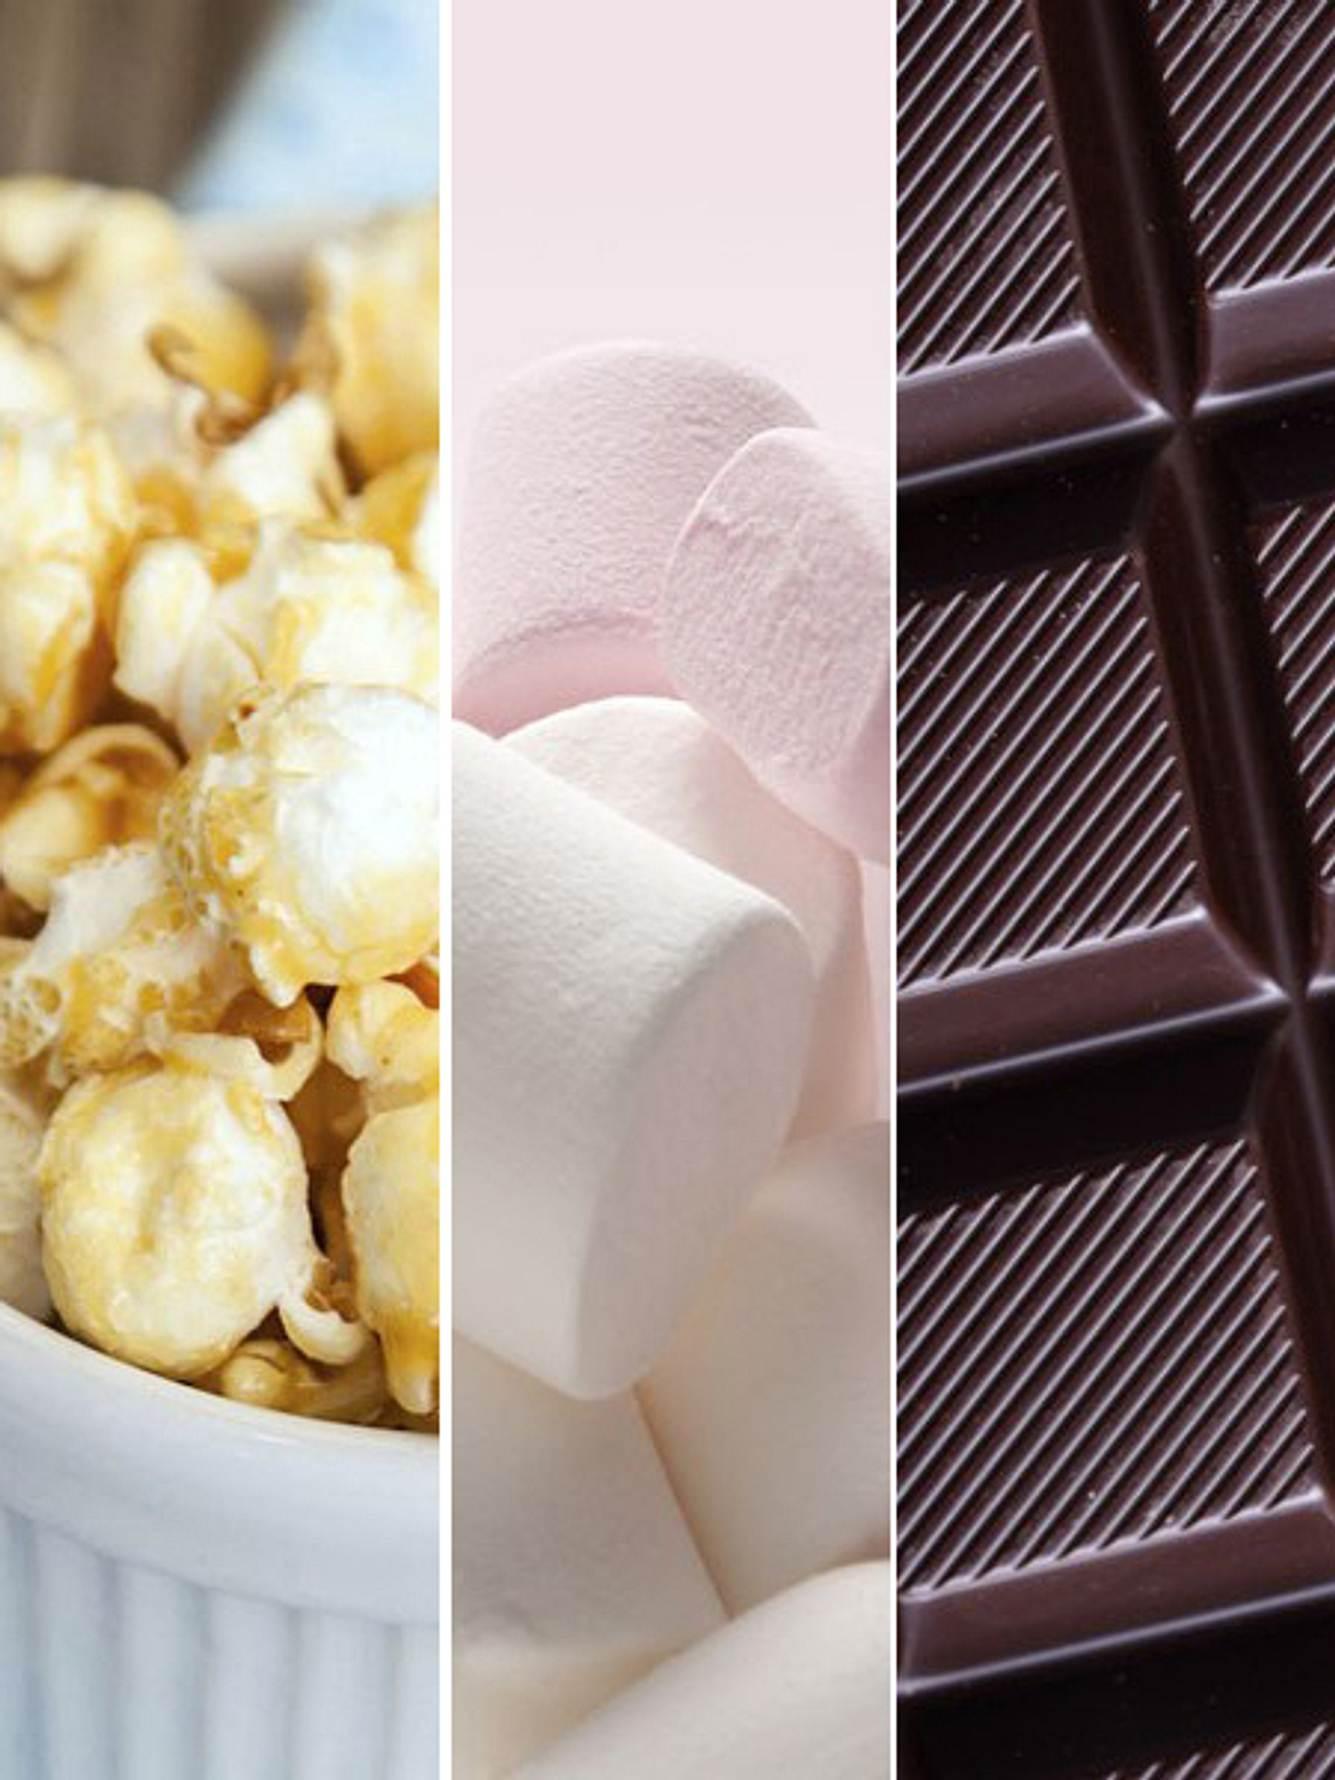 kalorienarme snacks kcal